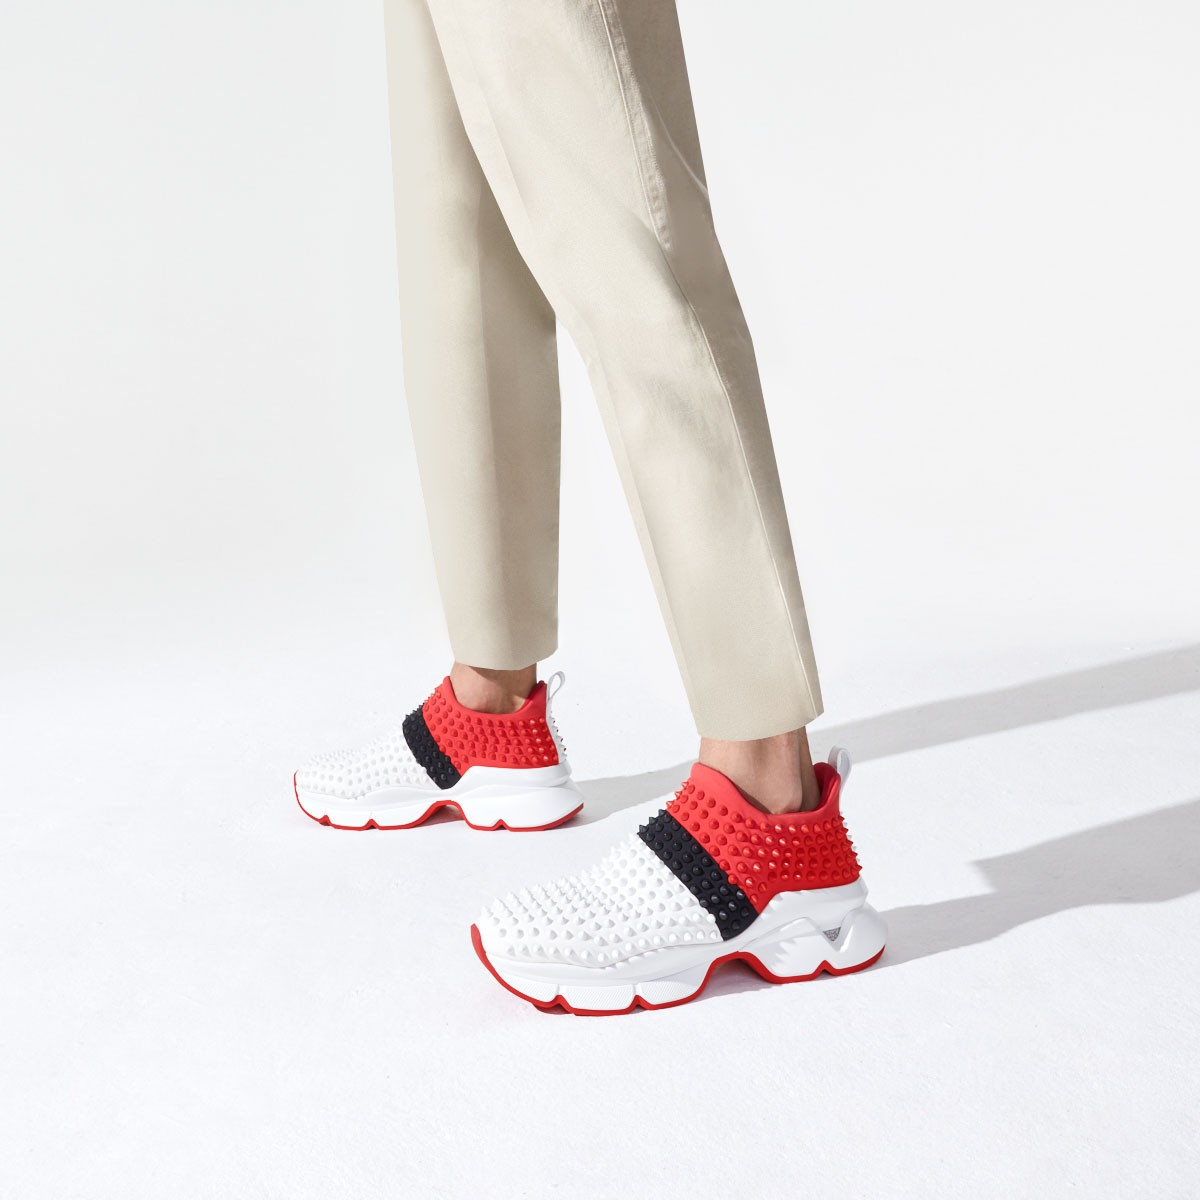 Shoes - Spike Sock - Christian Louboutin